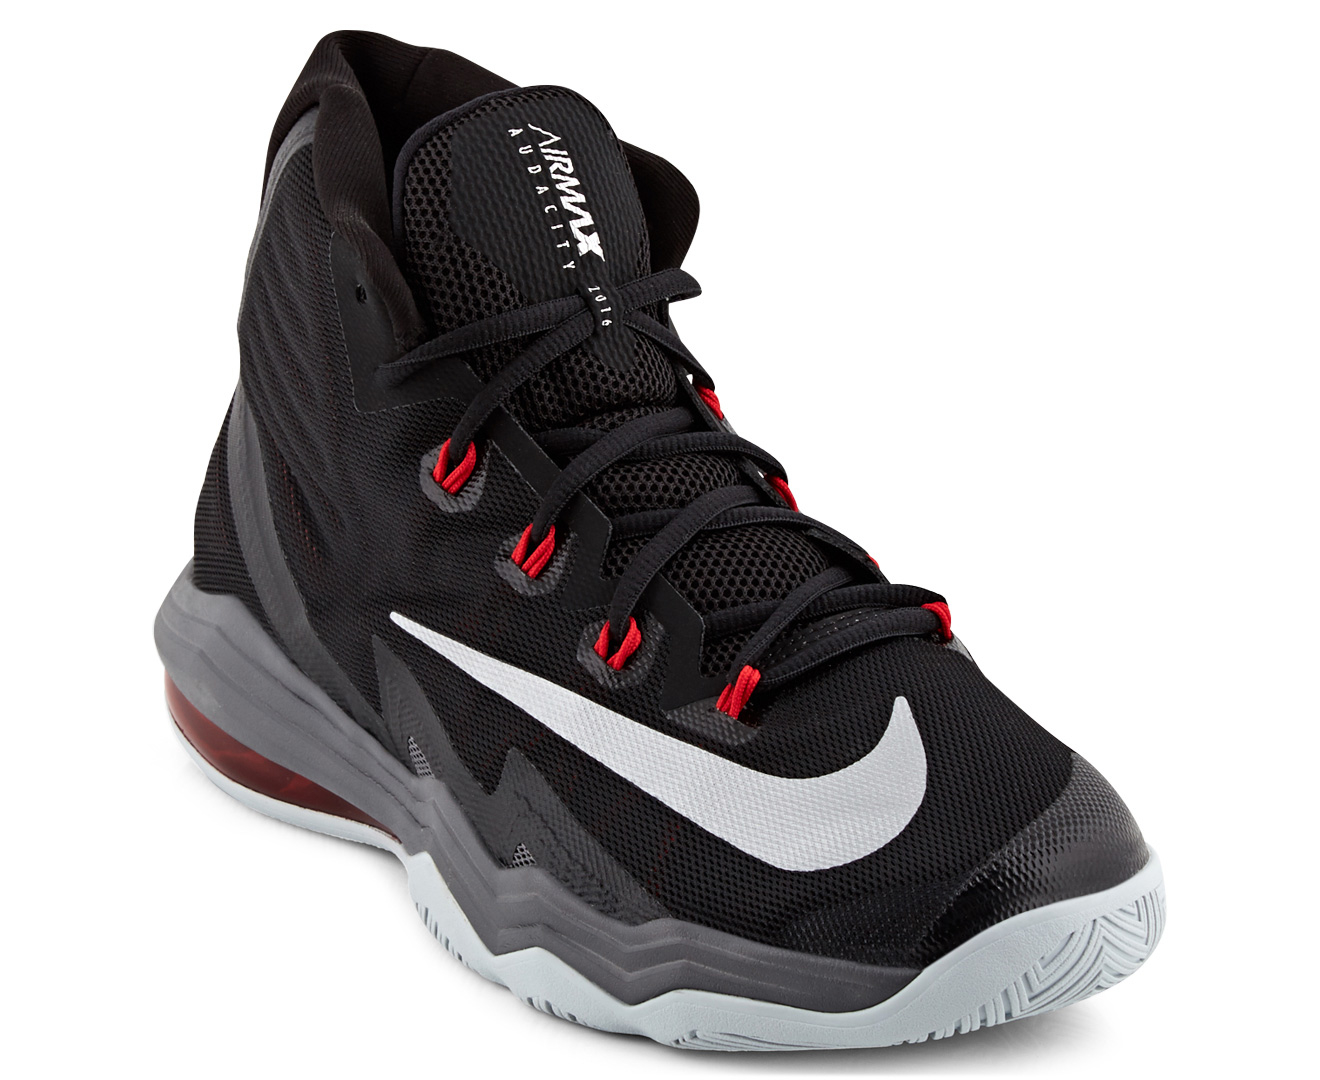 2020 Nike Christmas Shoes Zara Boots Womens 2020 Nike Christmas Shoes | Wstffr